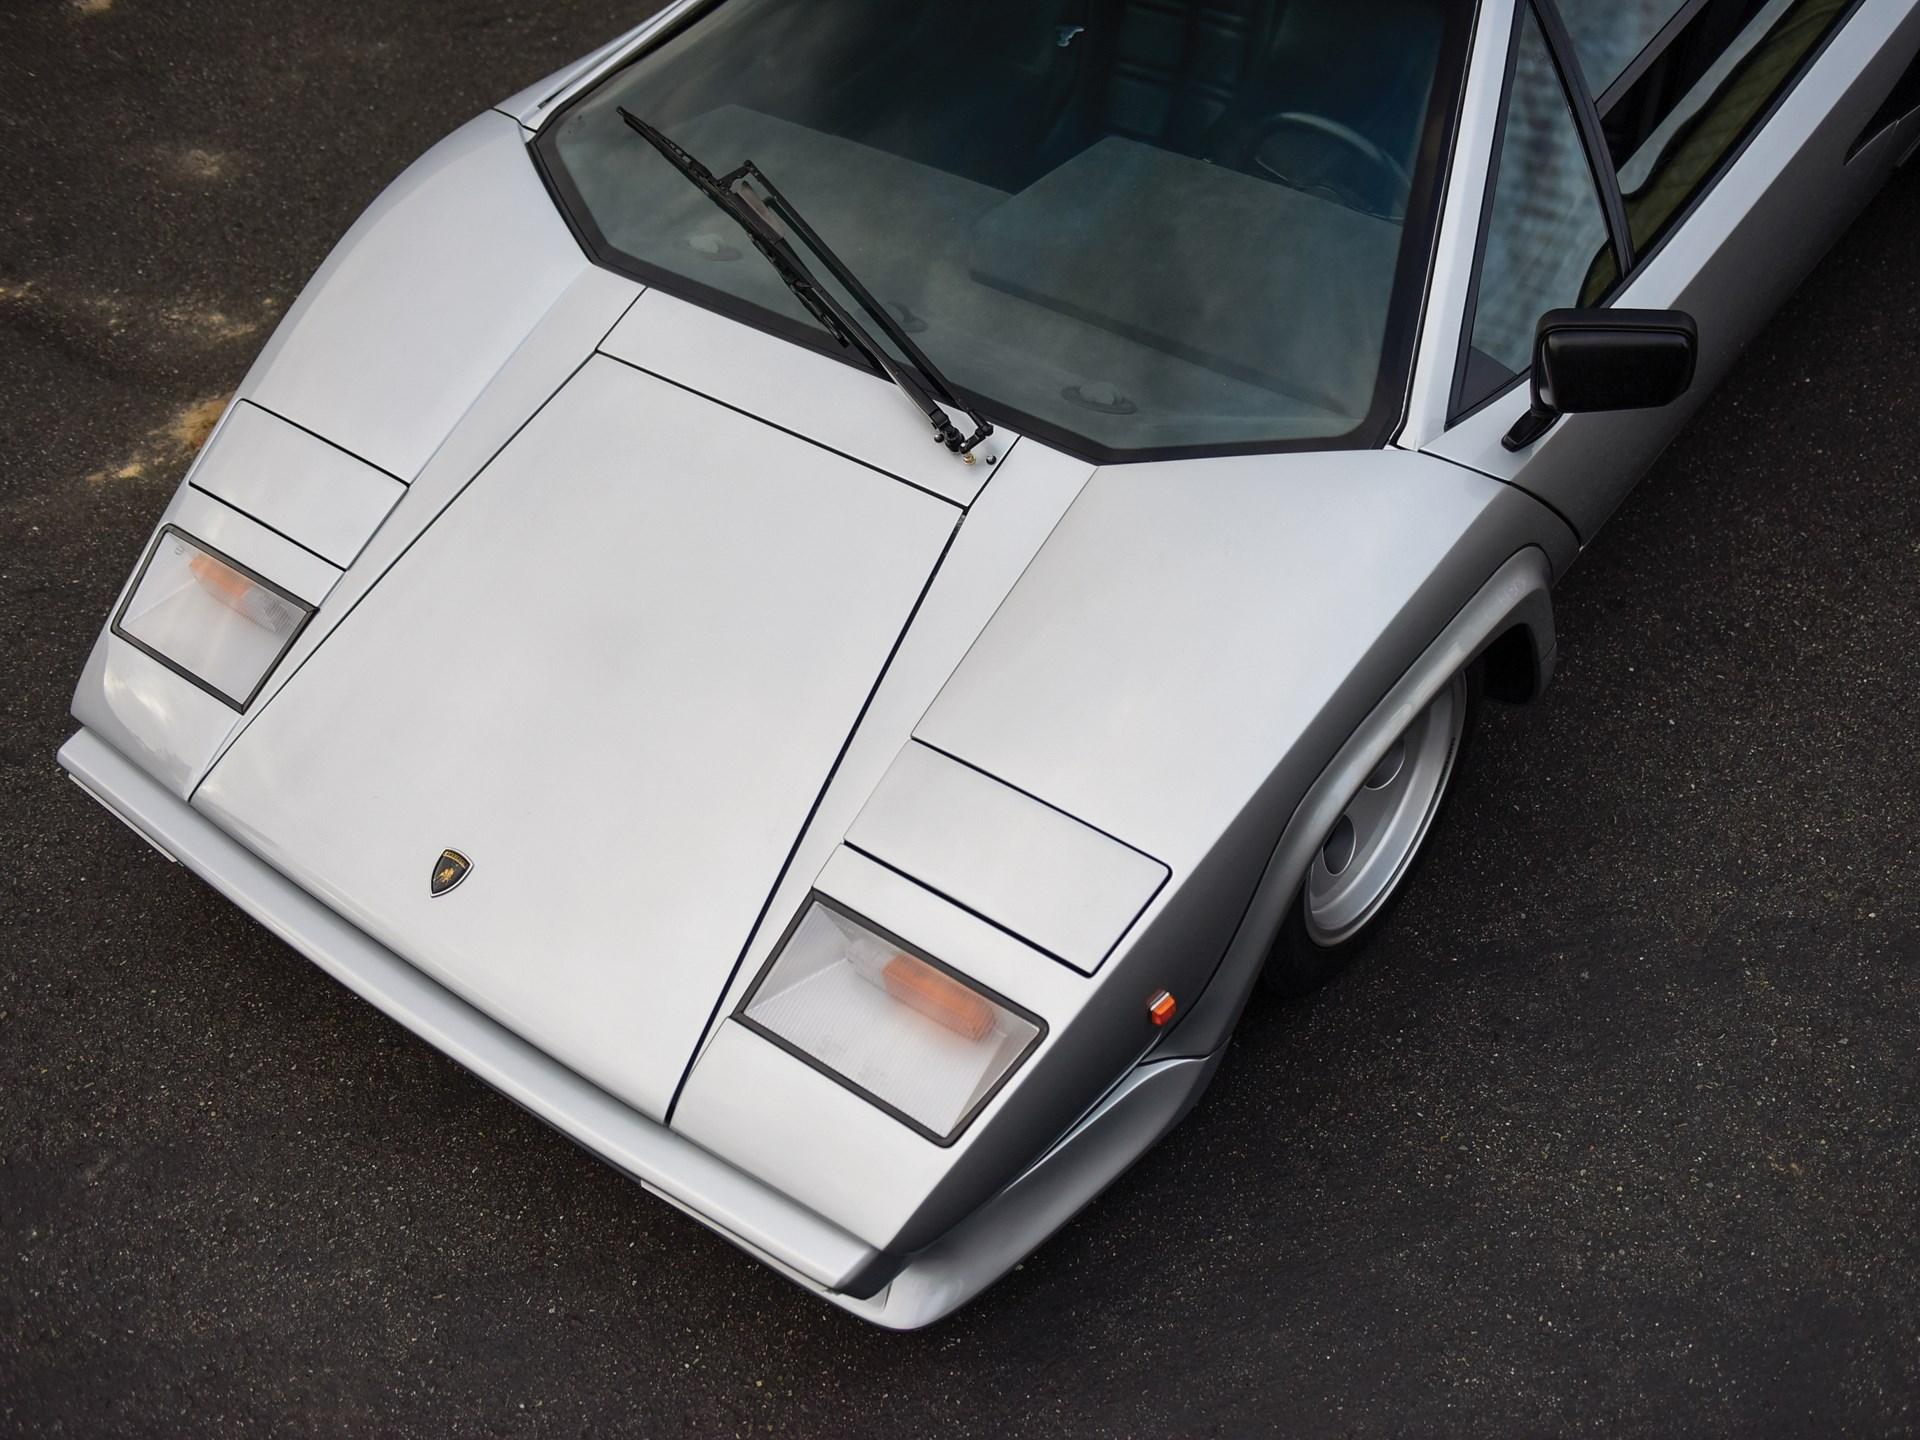 1981 Lamborghini Countach LP400 S Series II by Bertone